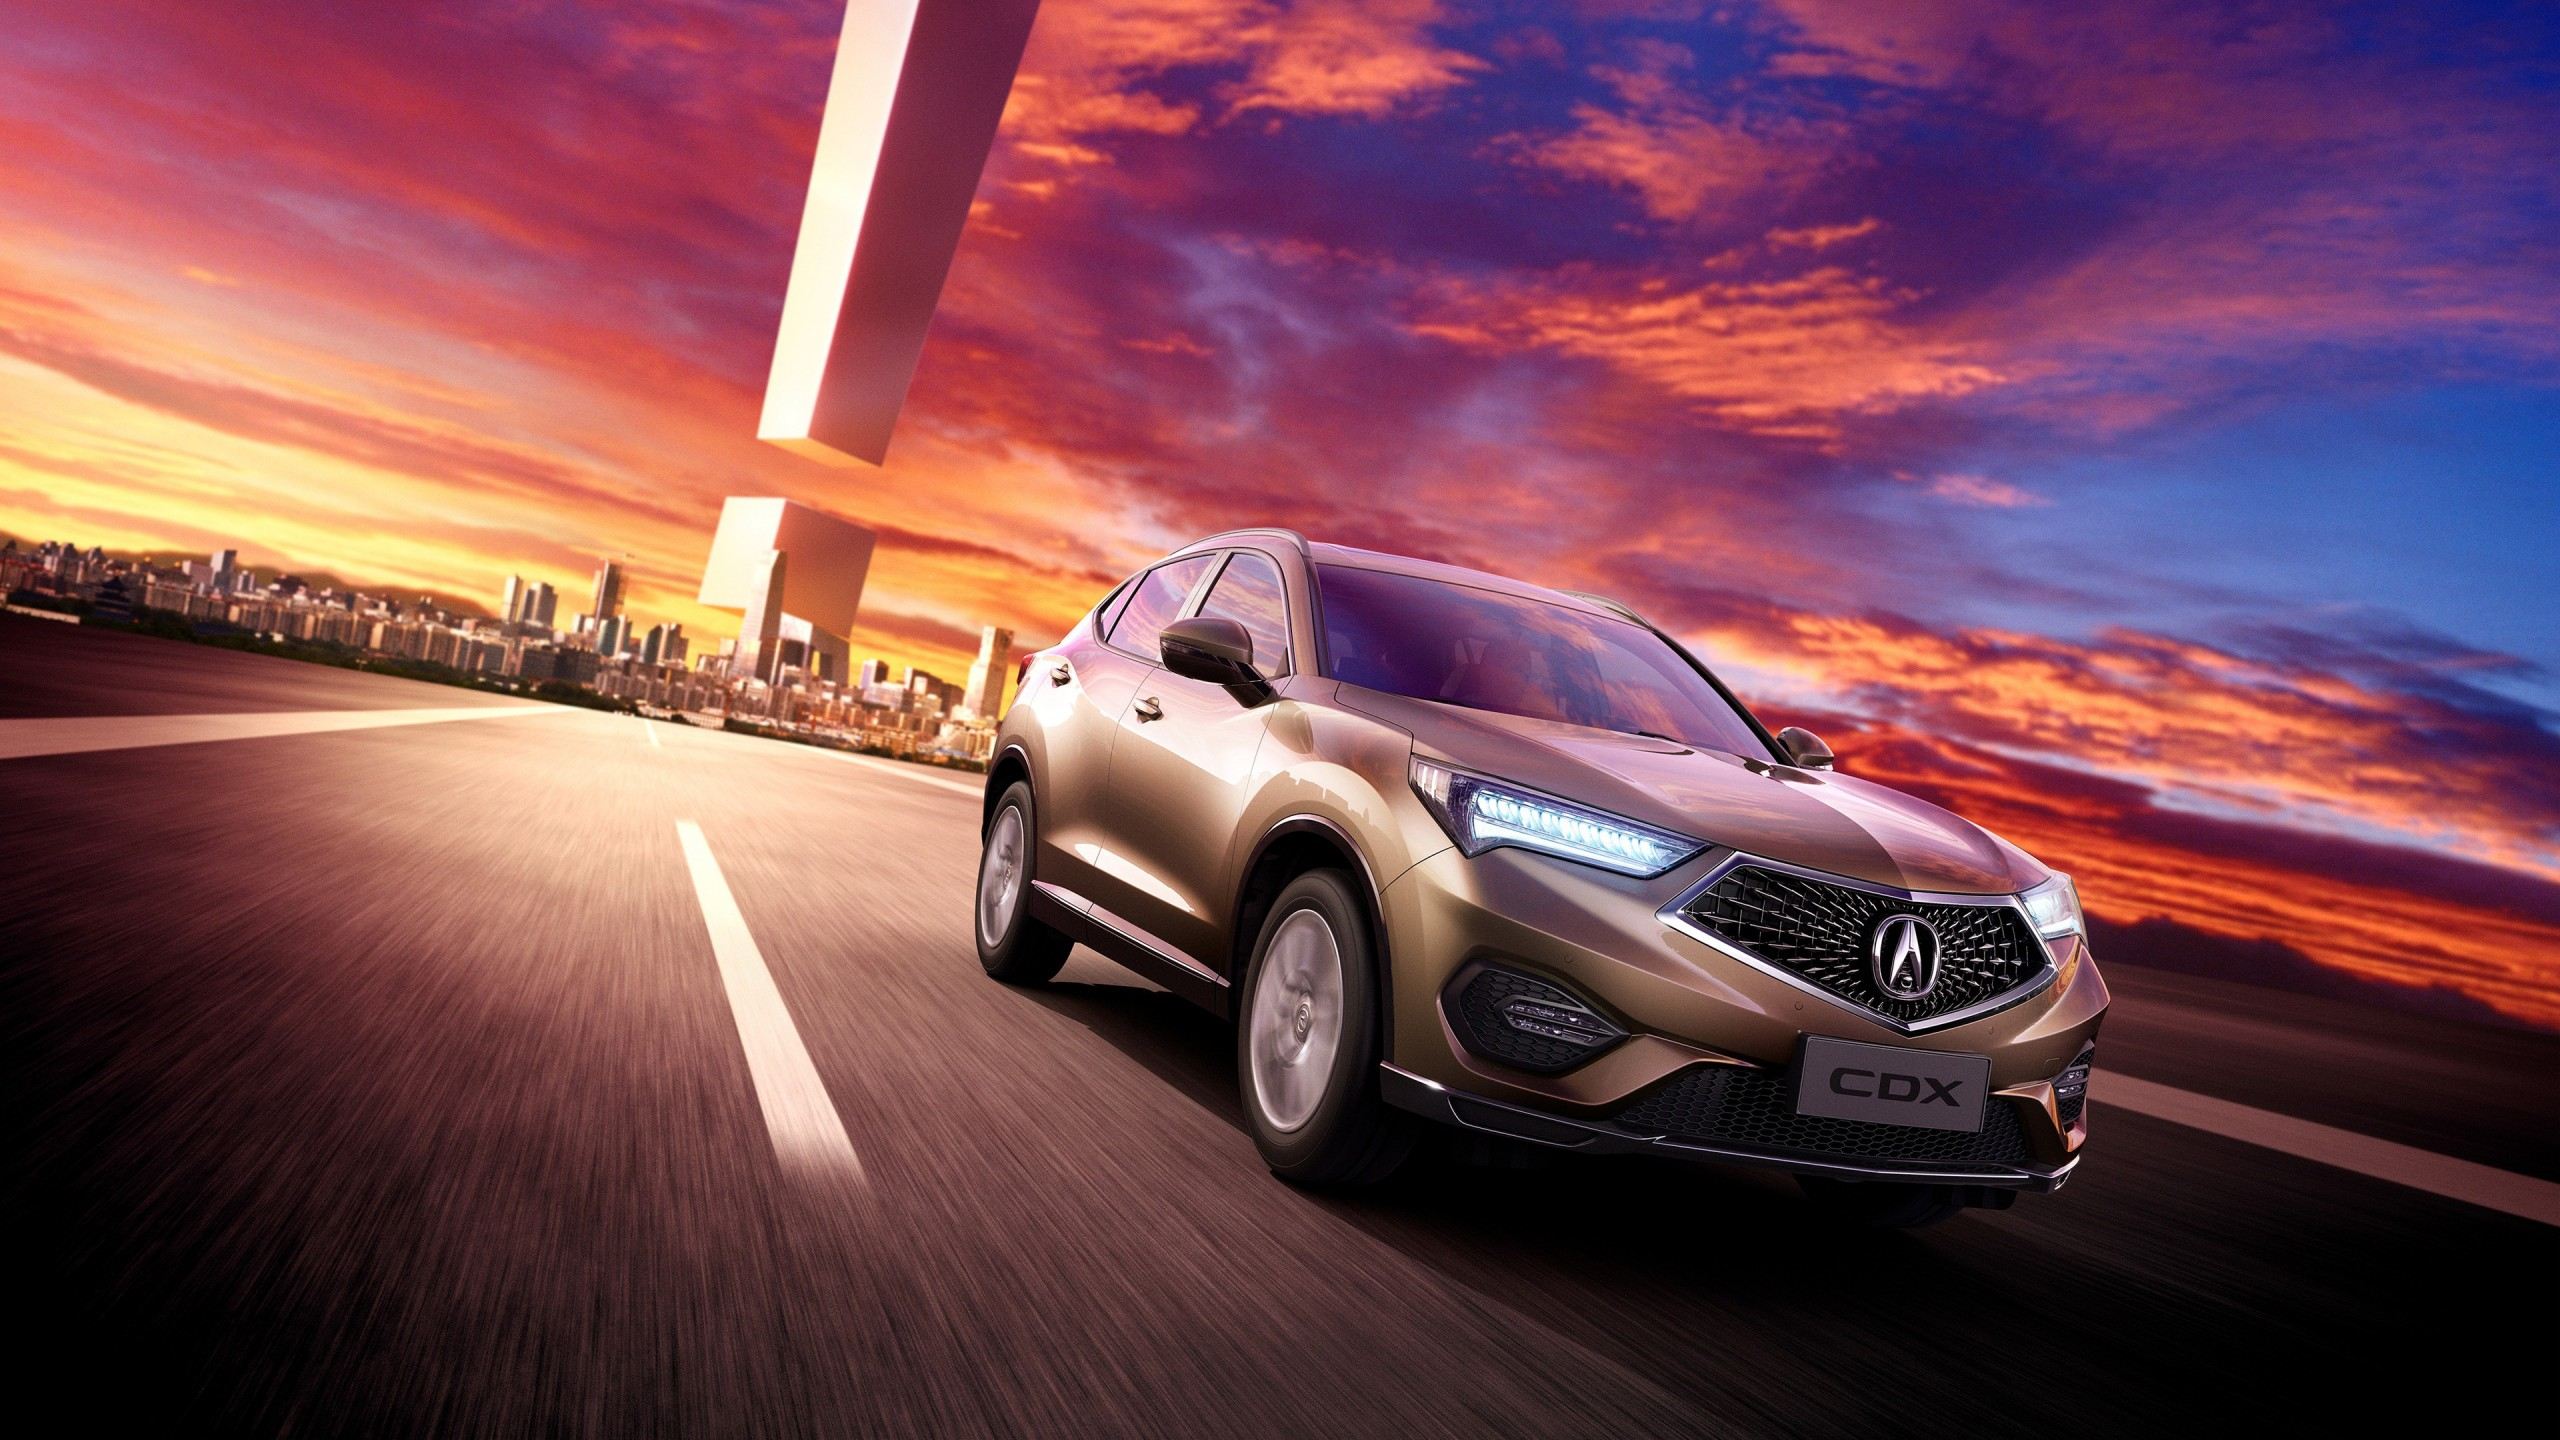 2017 acura cdx wallpaper hd car wallpapers